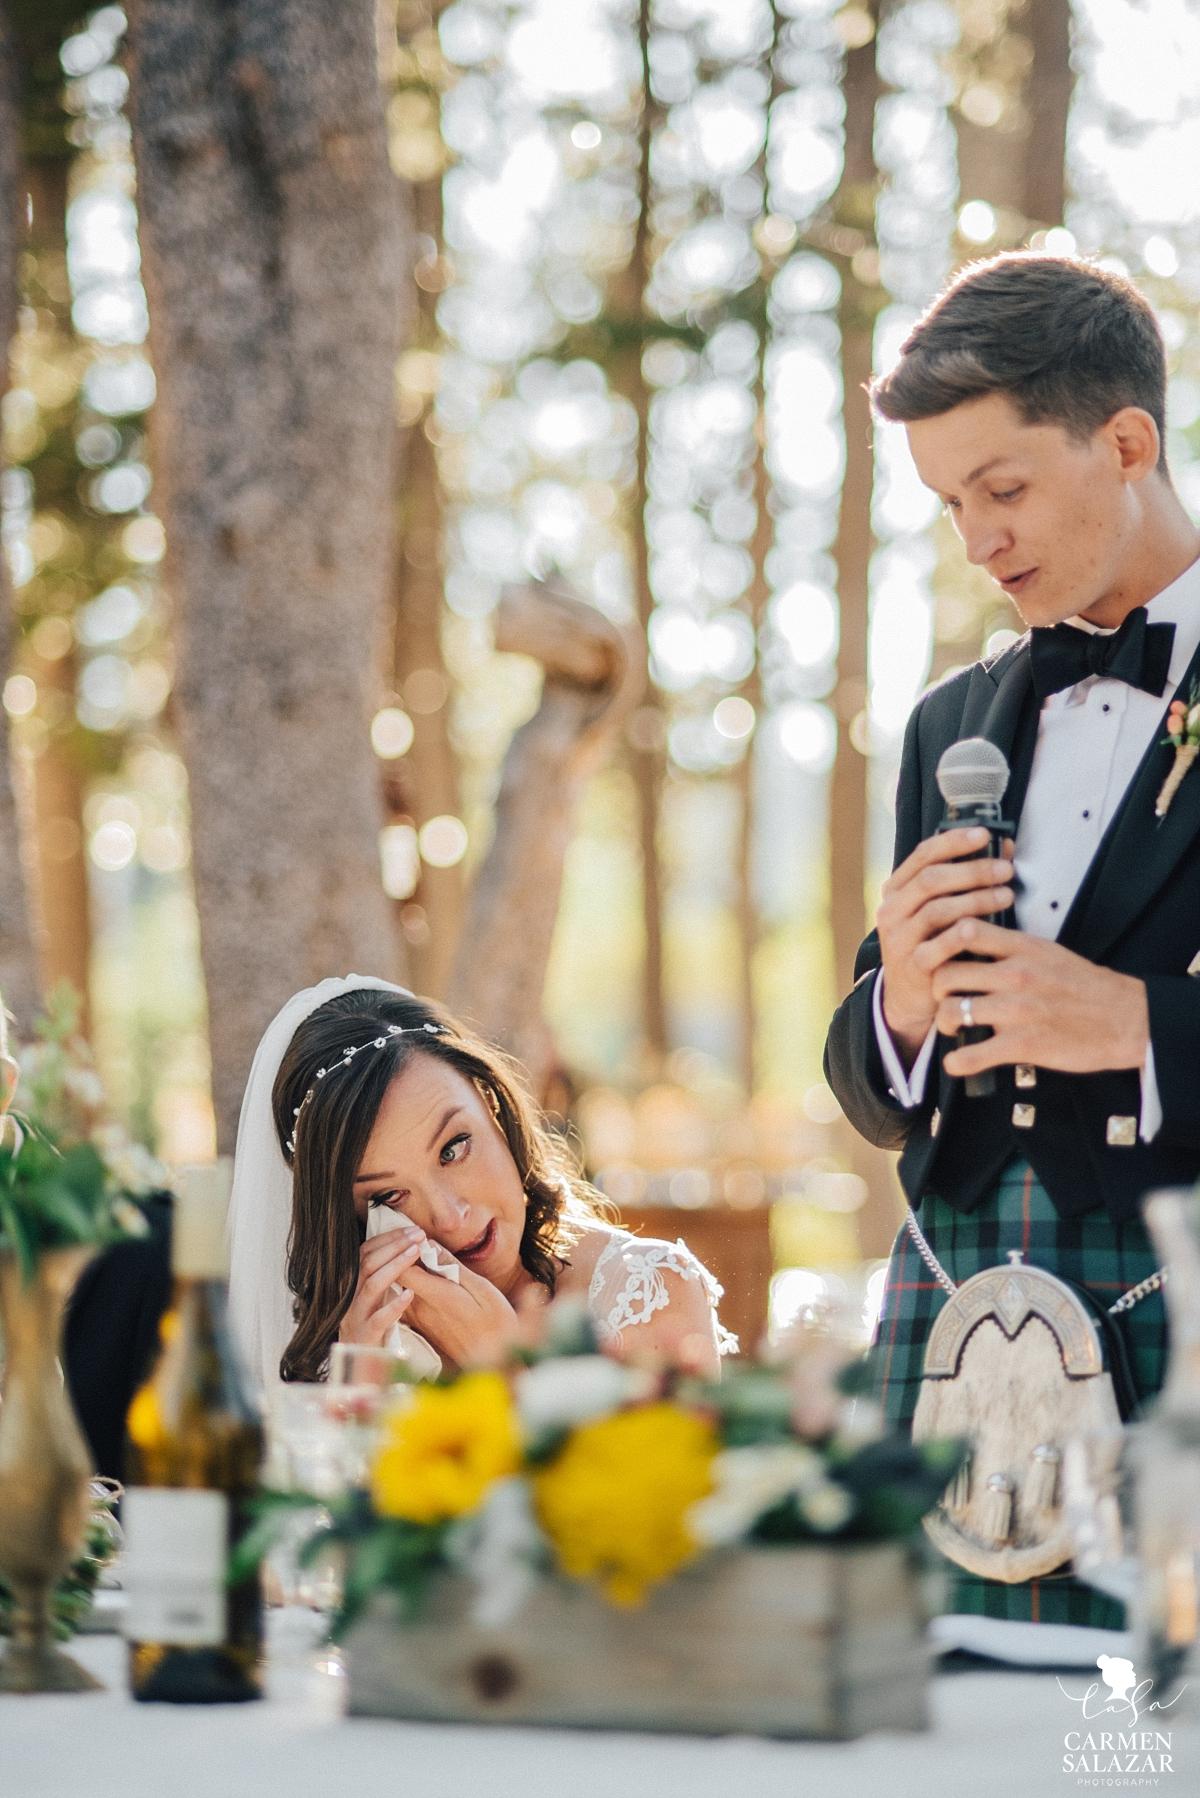 Bride crying at speeches at Kirkwood reception - Carmen Salazar